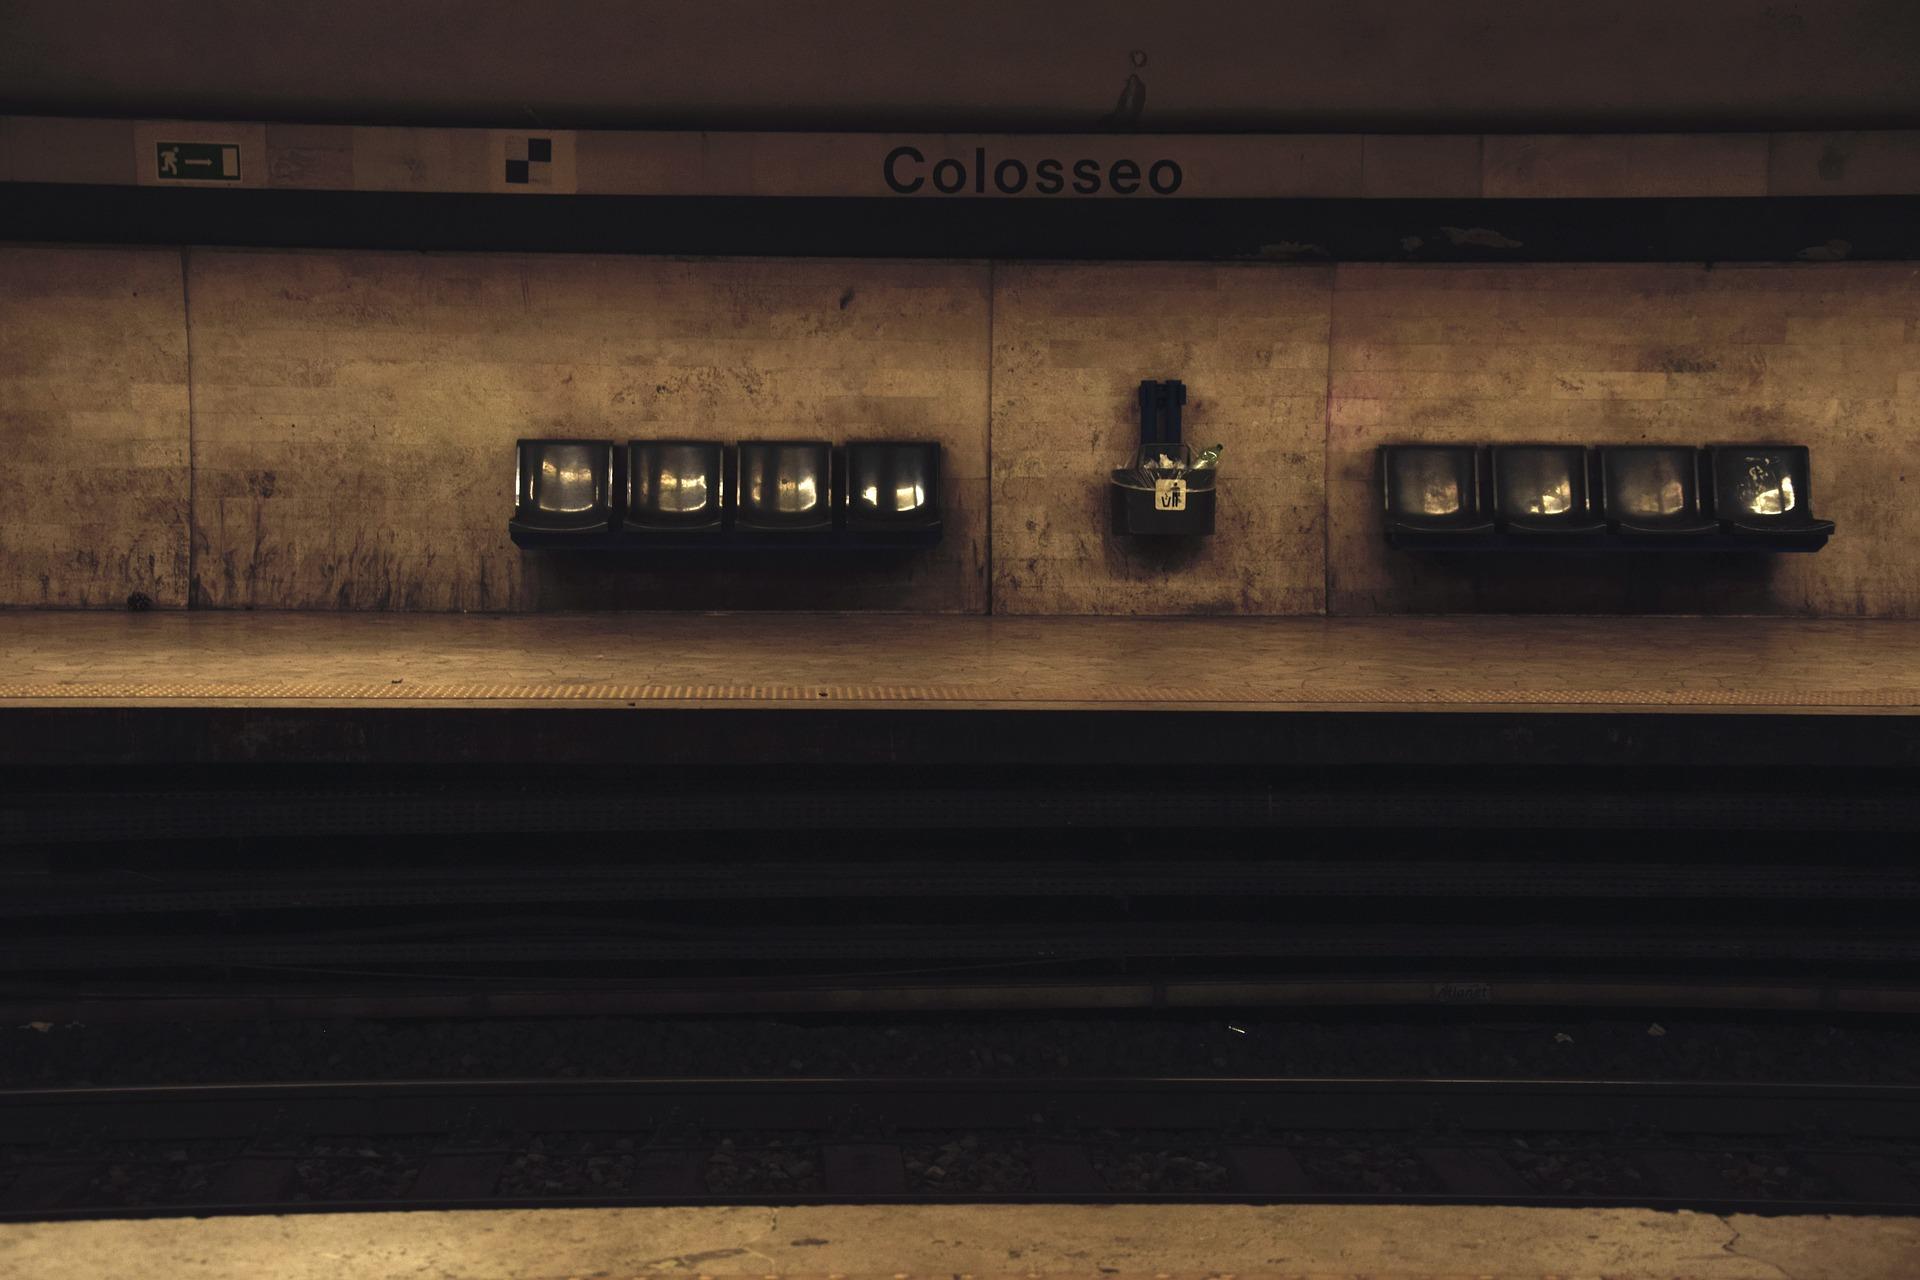 Quante linee di metropolitana ha Roma